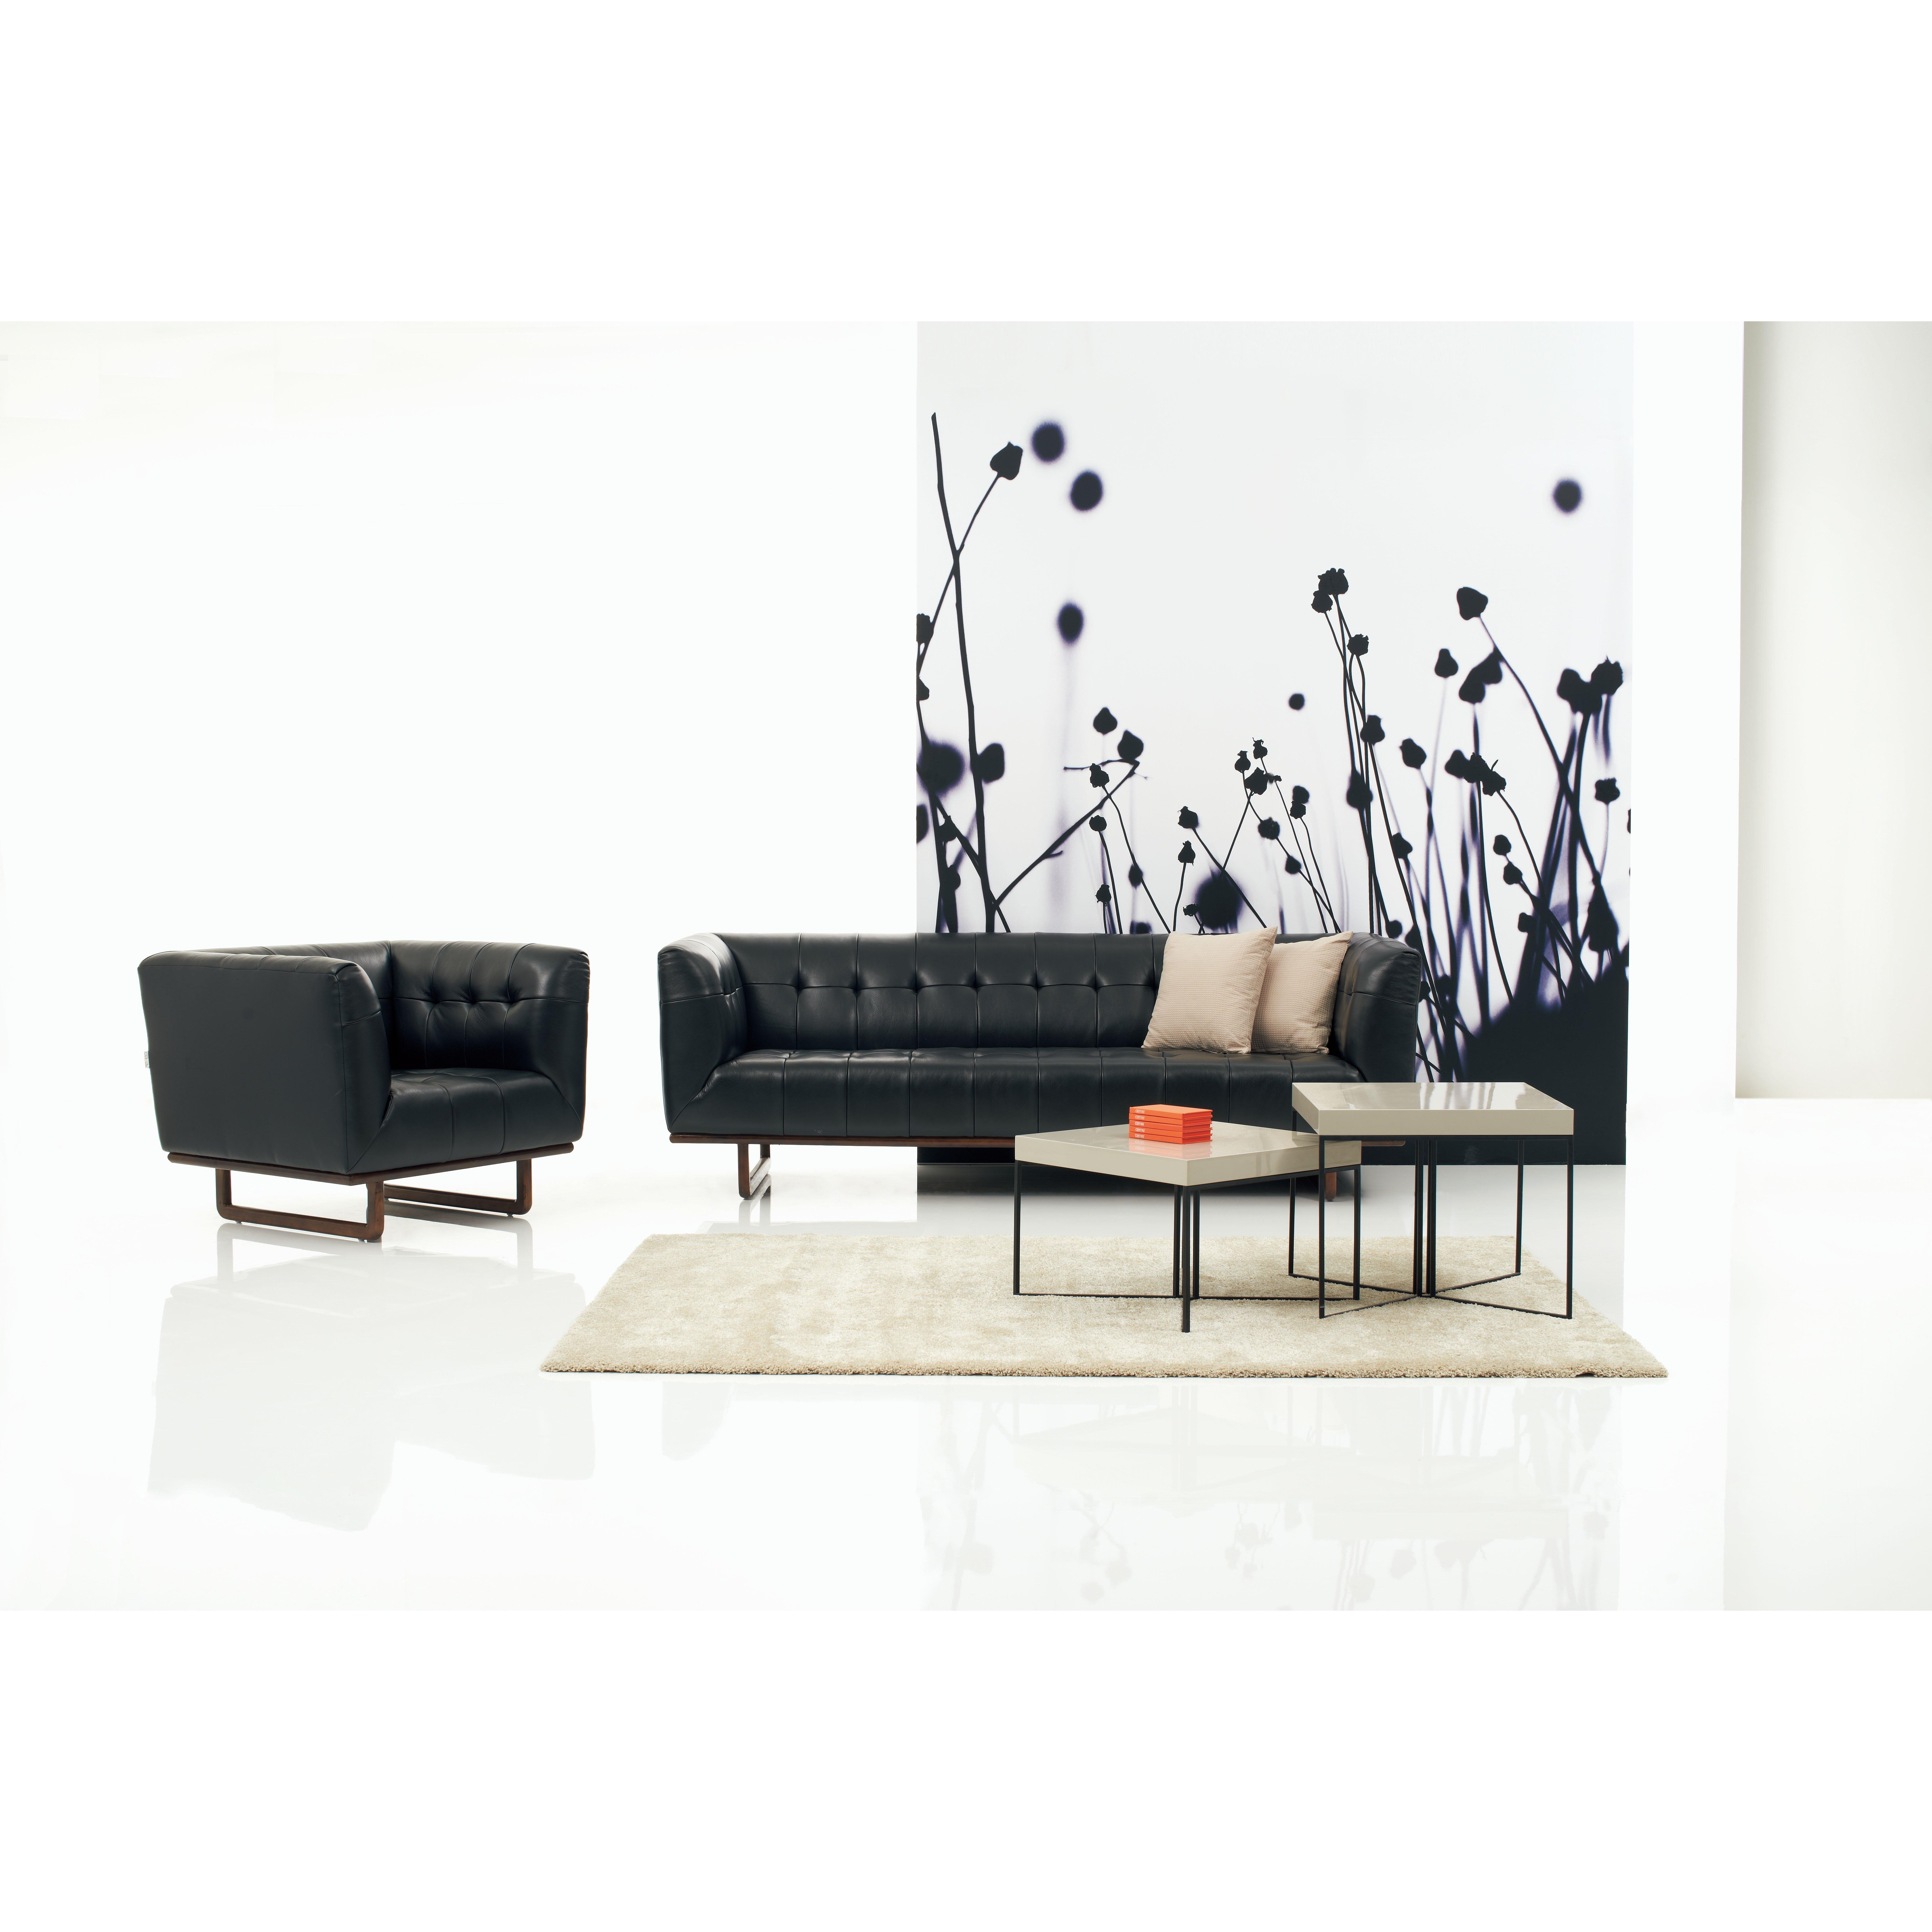 Argo Furniture Luna Coffee Table Reviews Wayfair